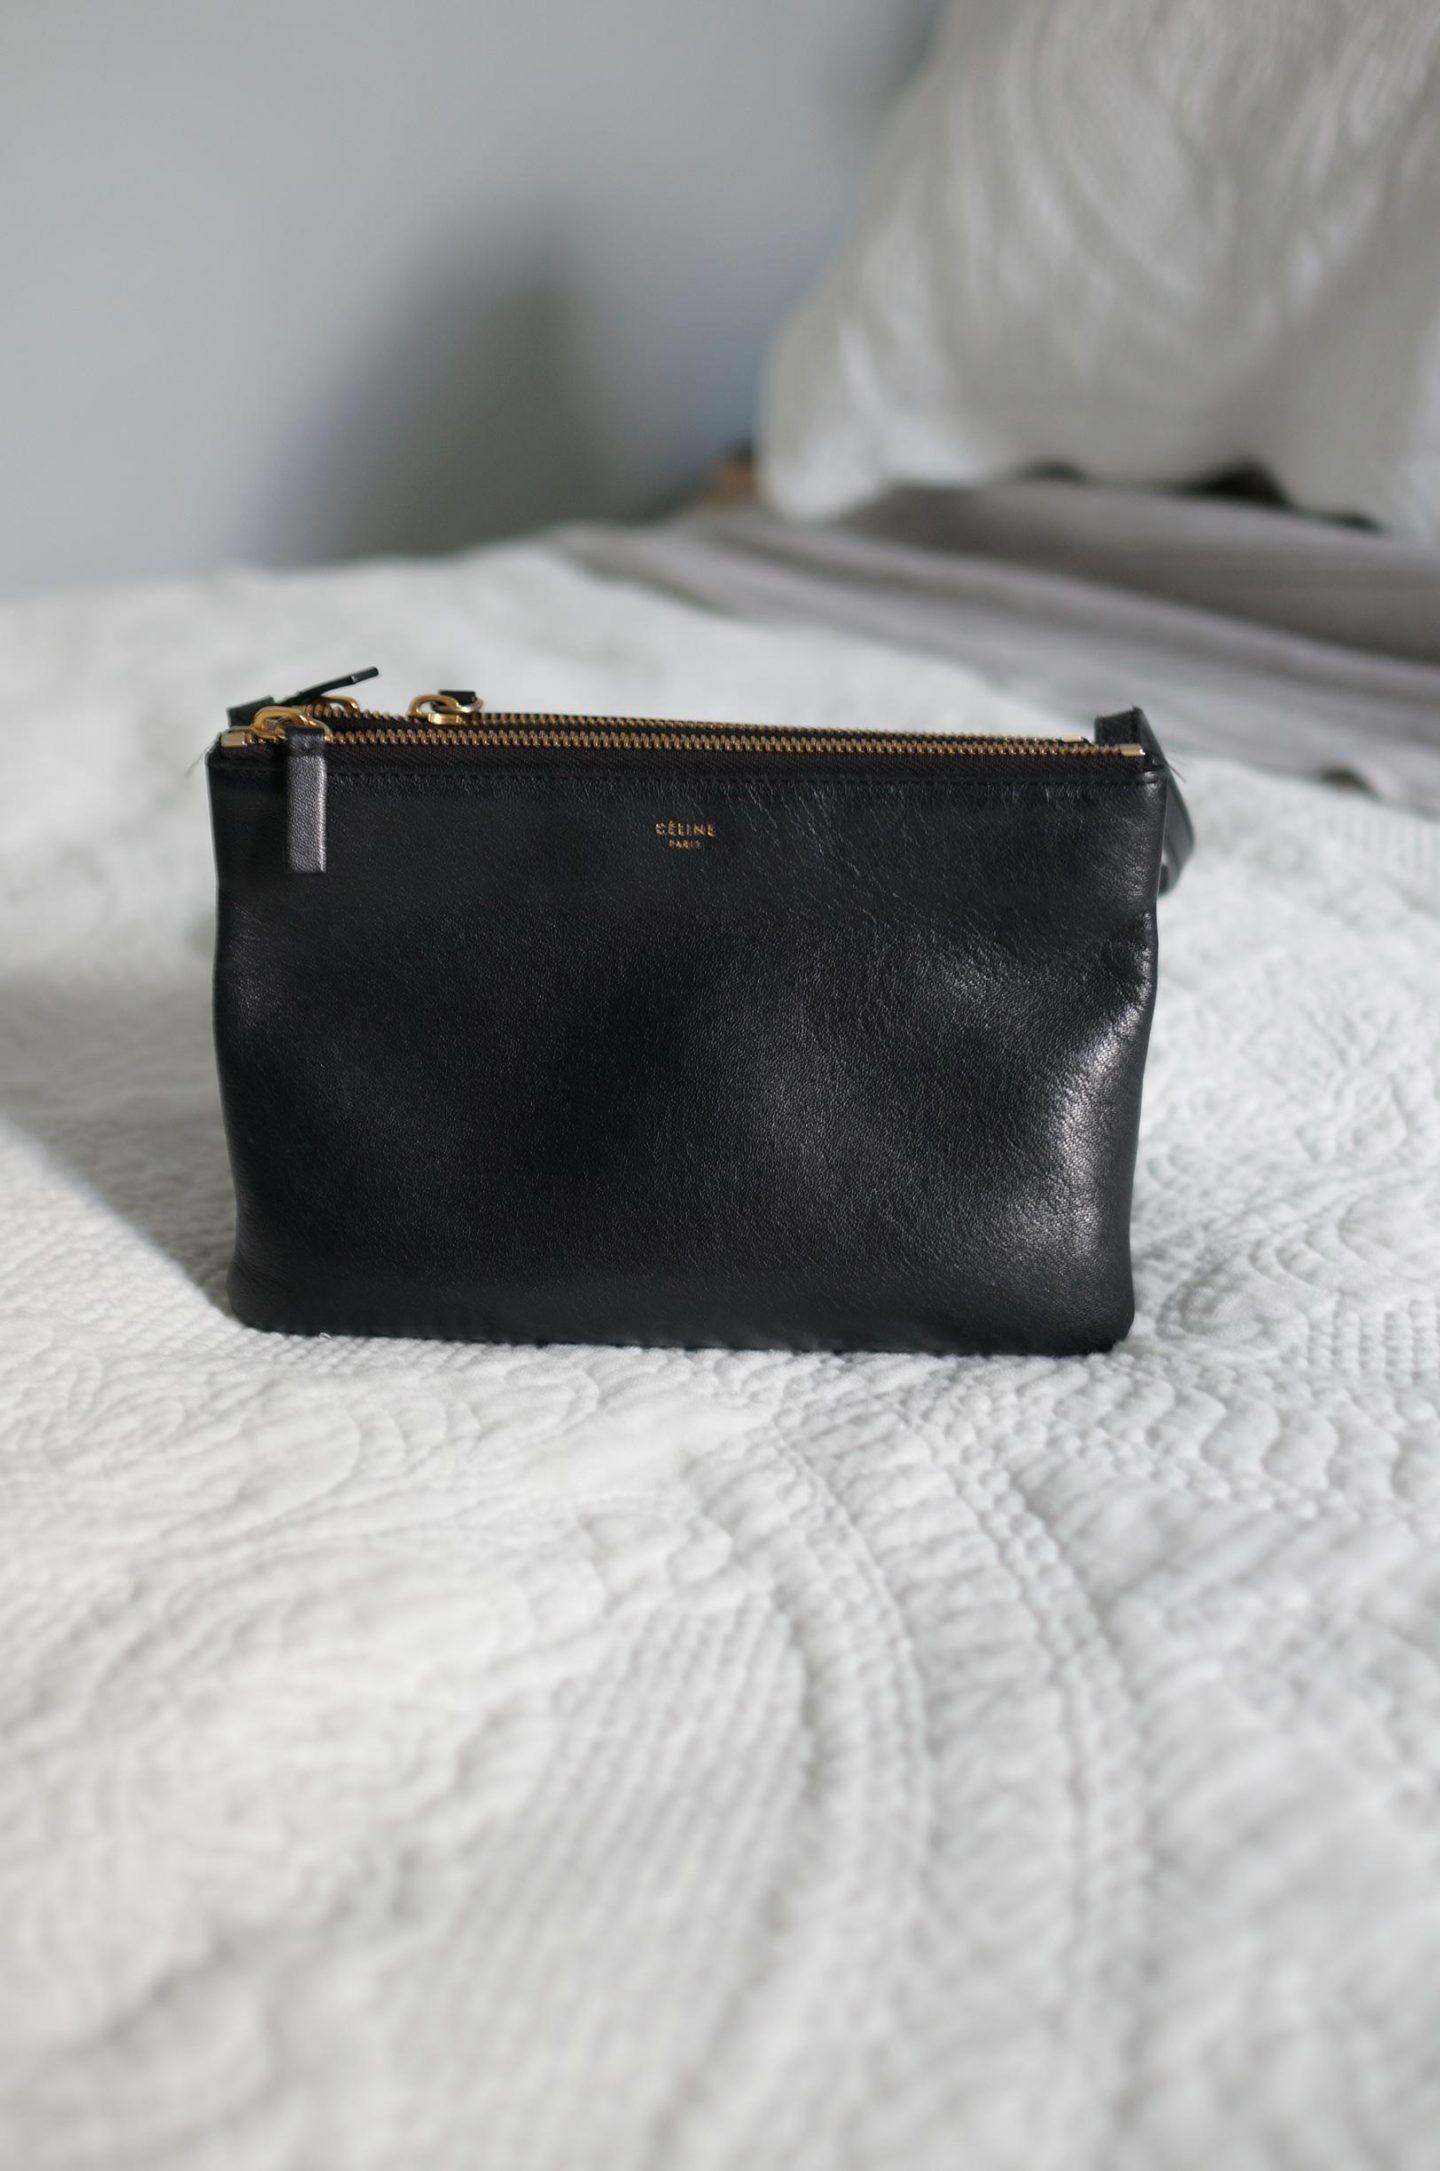 celine bag collection featuring celine trio bag in black